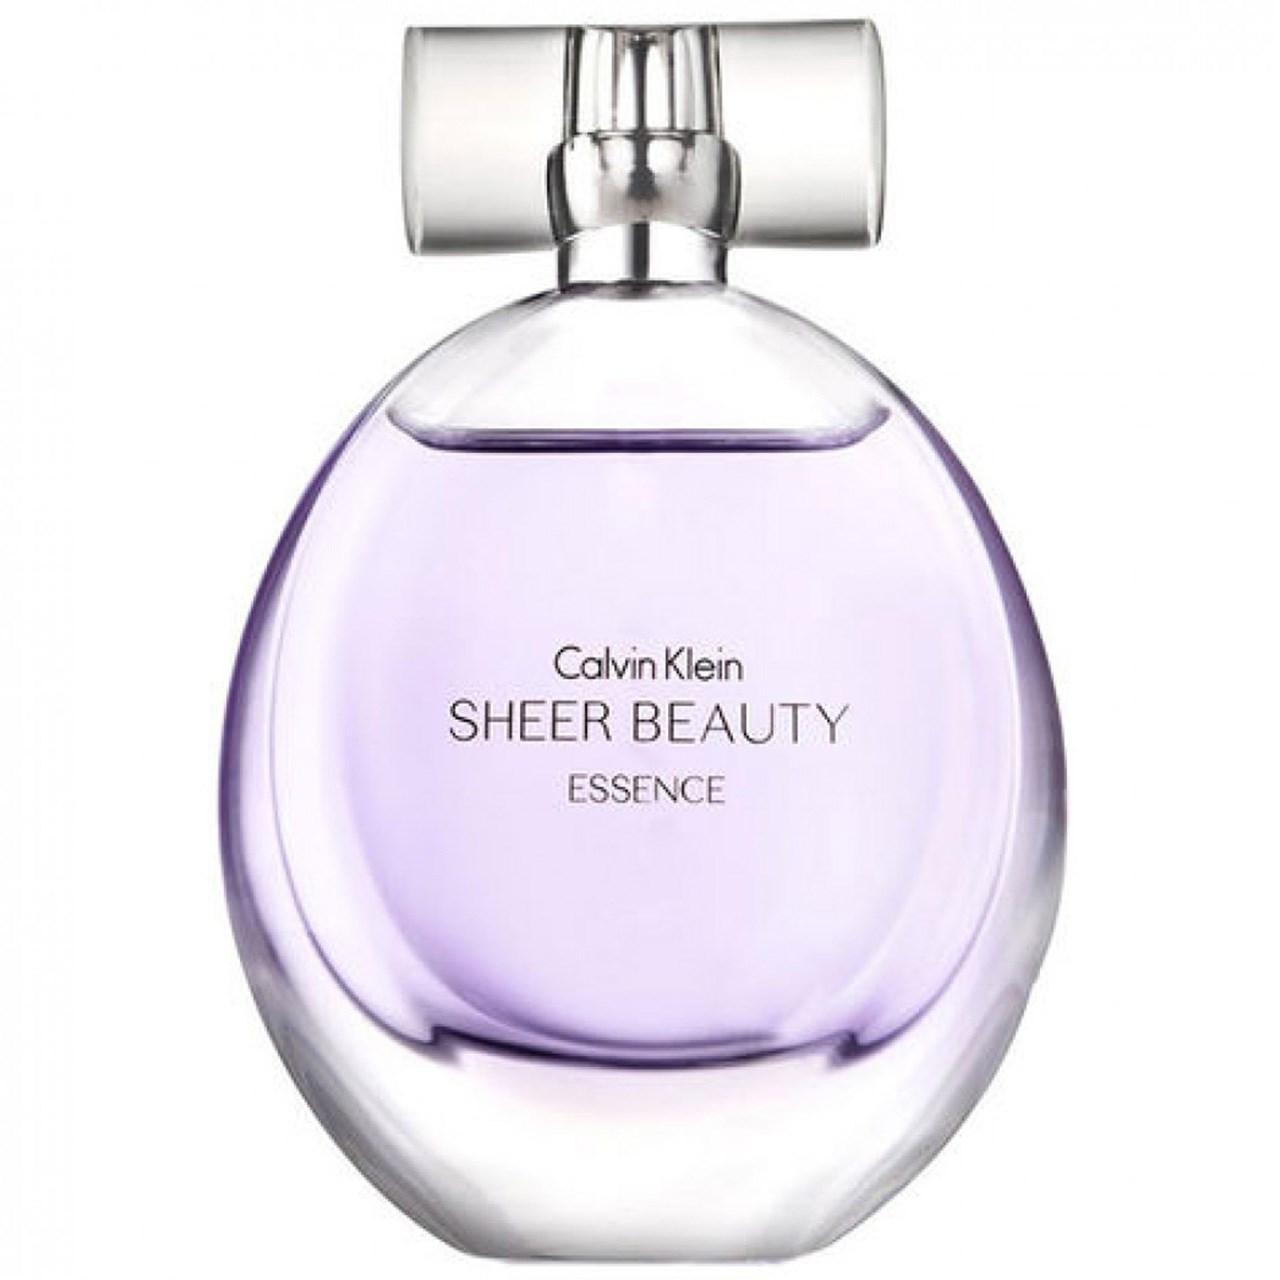 ادو تویلت زنانه کلوین کلاین مدل Sheer Beauty Essence حجم 100 میلی لیتر